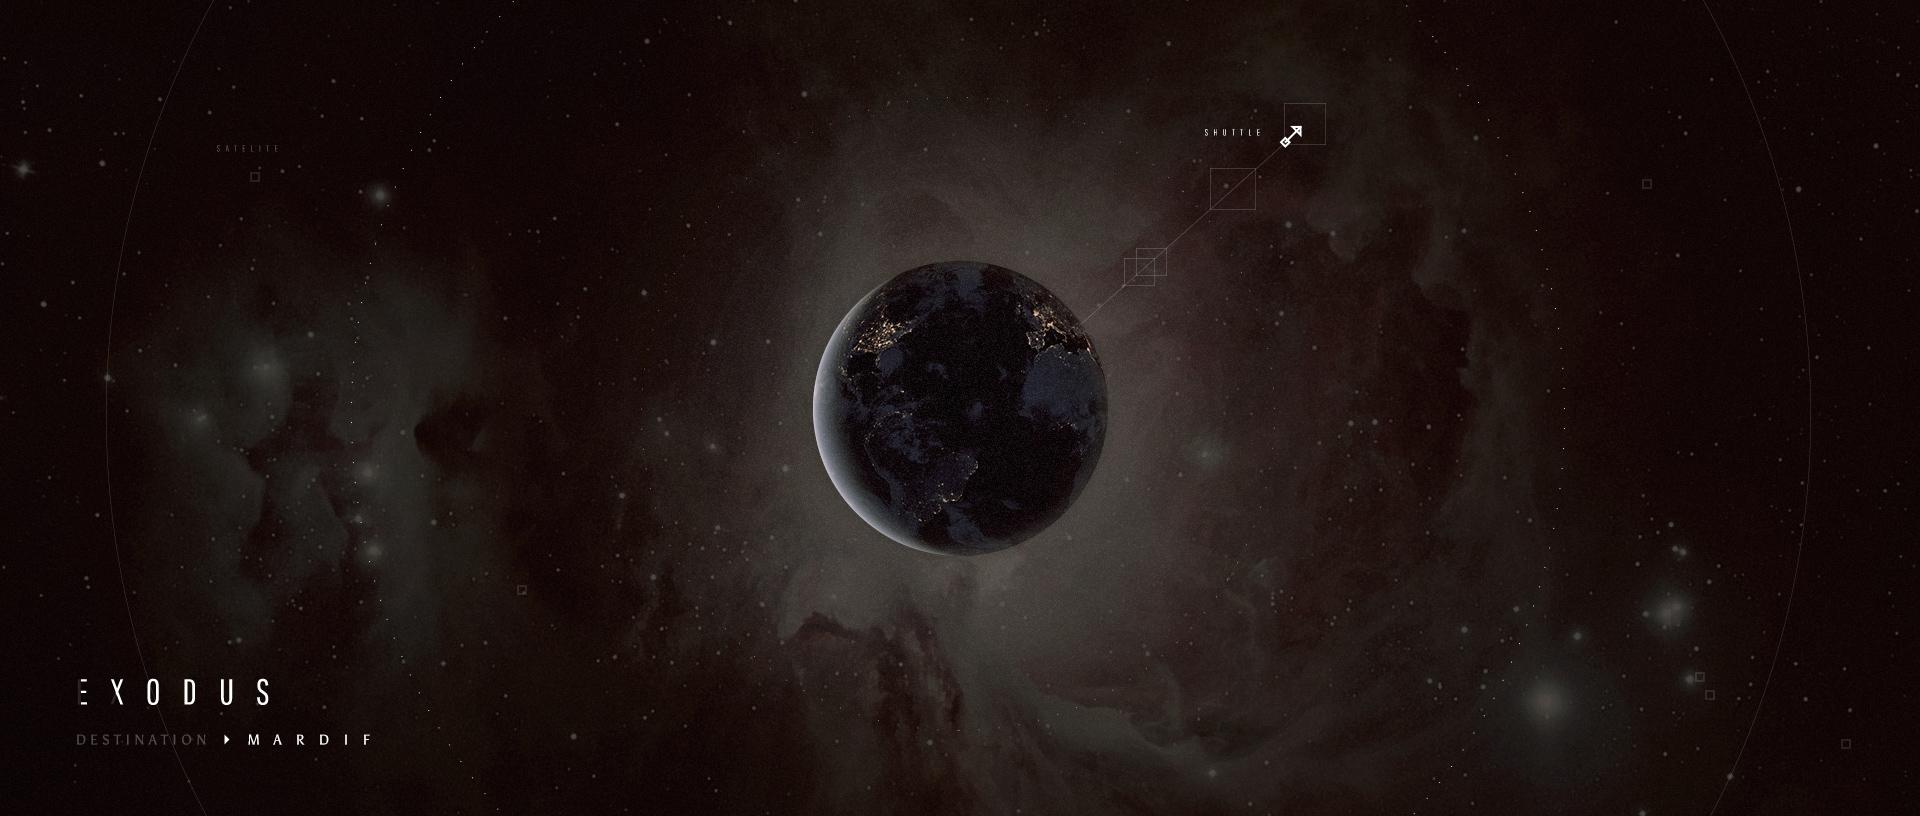 02-earth-tracking.jpg